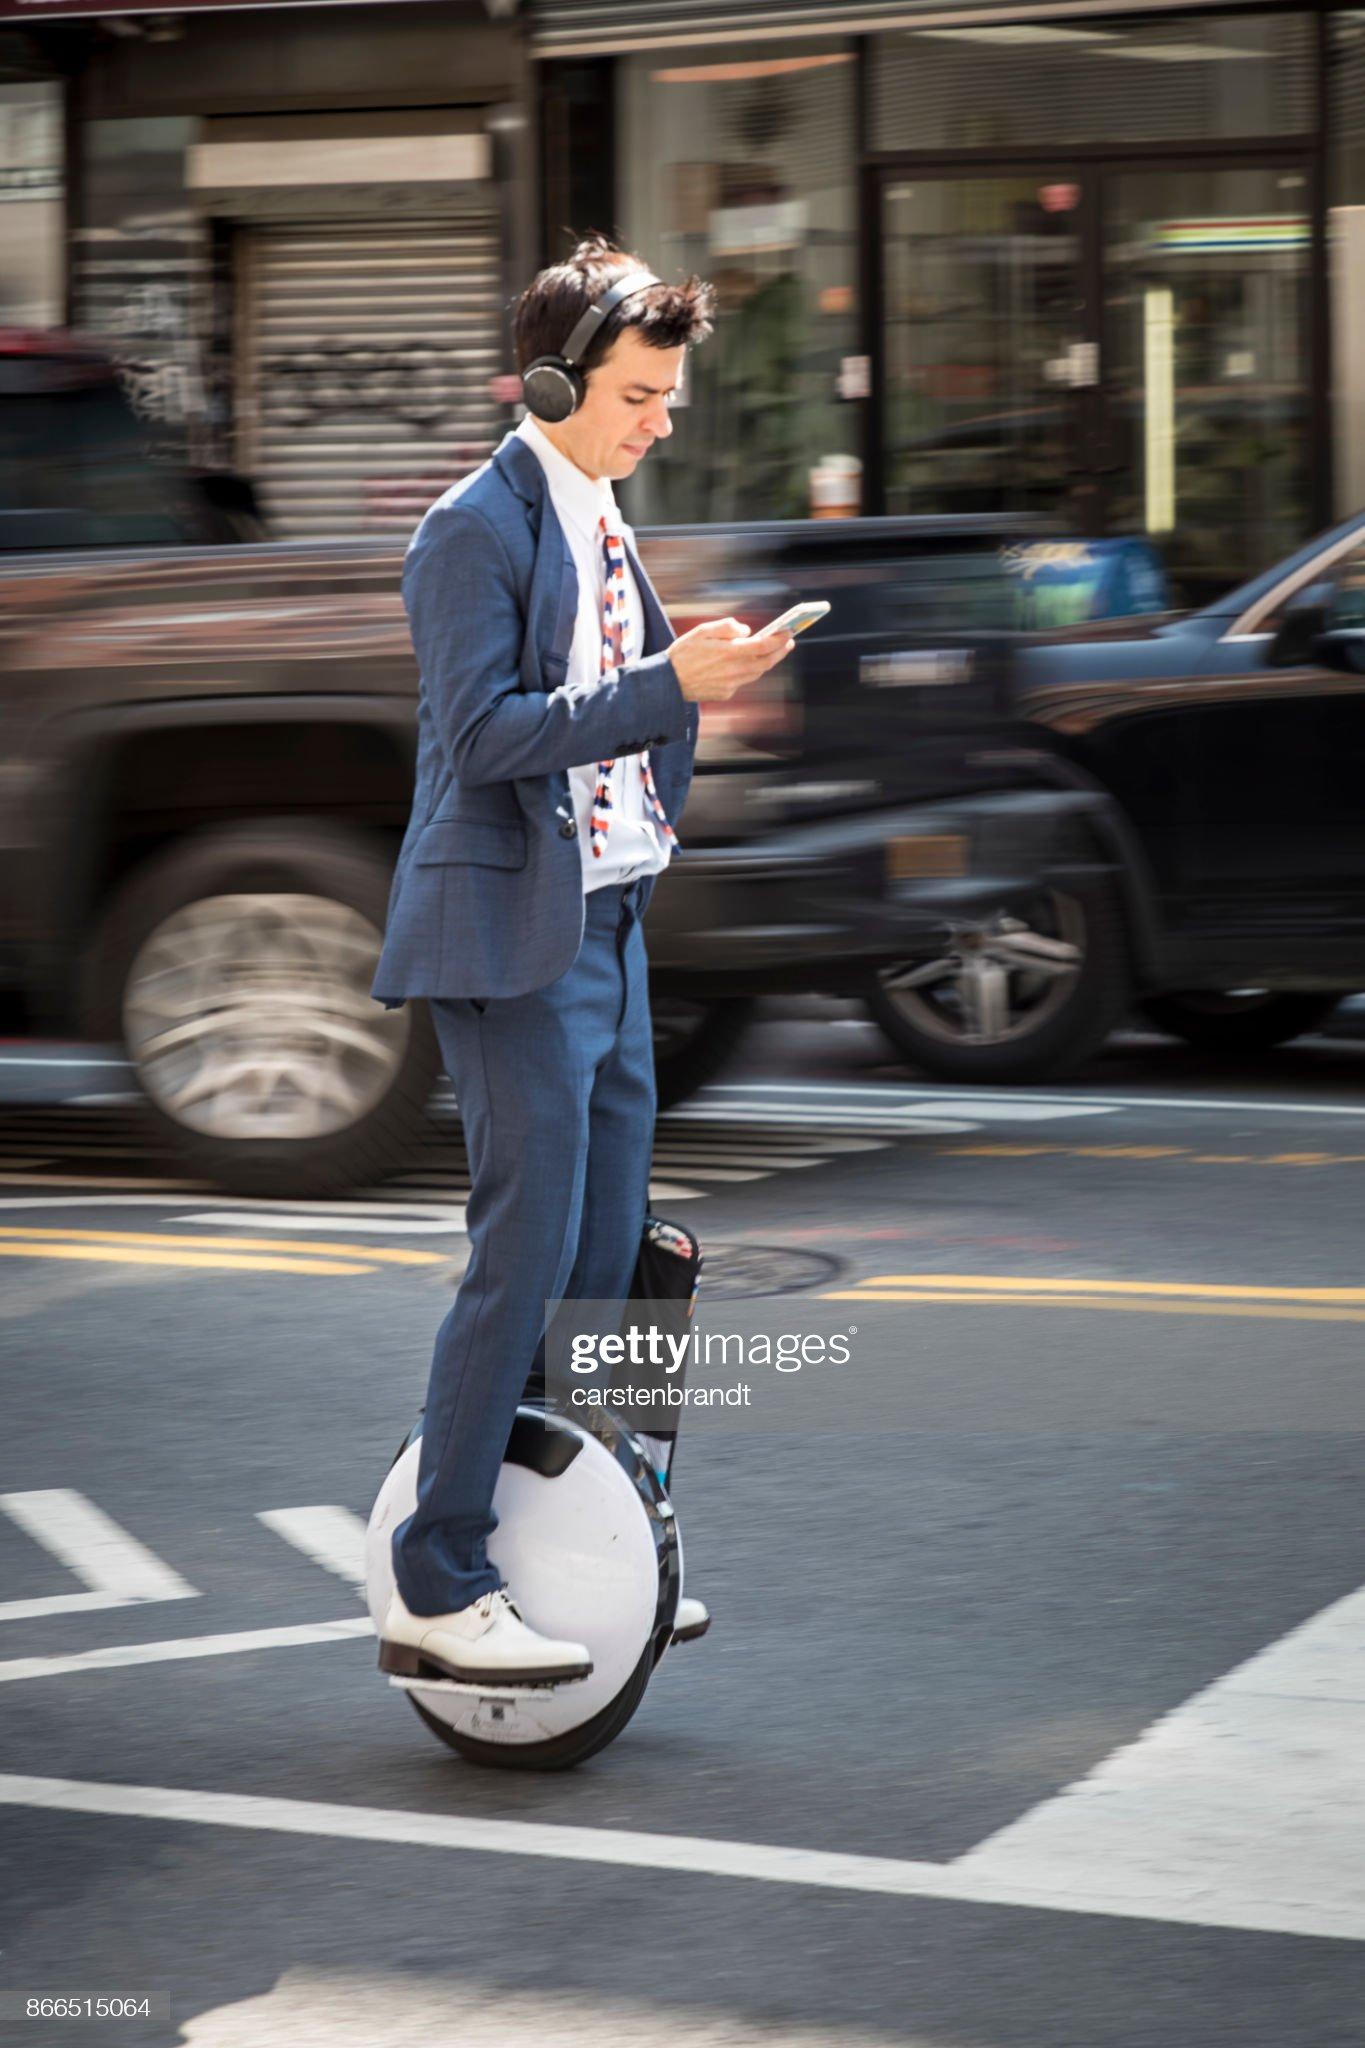 Young man on monowheel : Foto stock